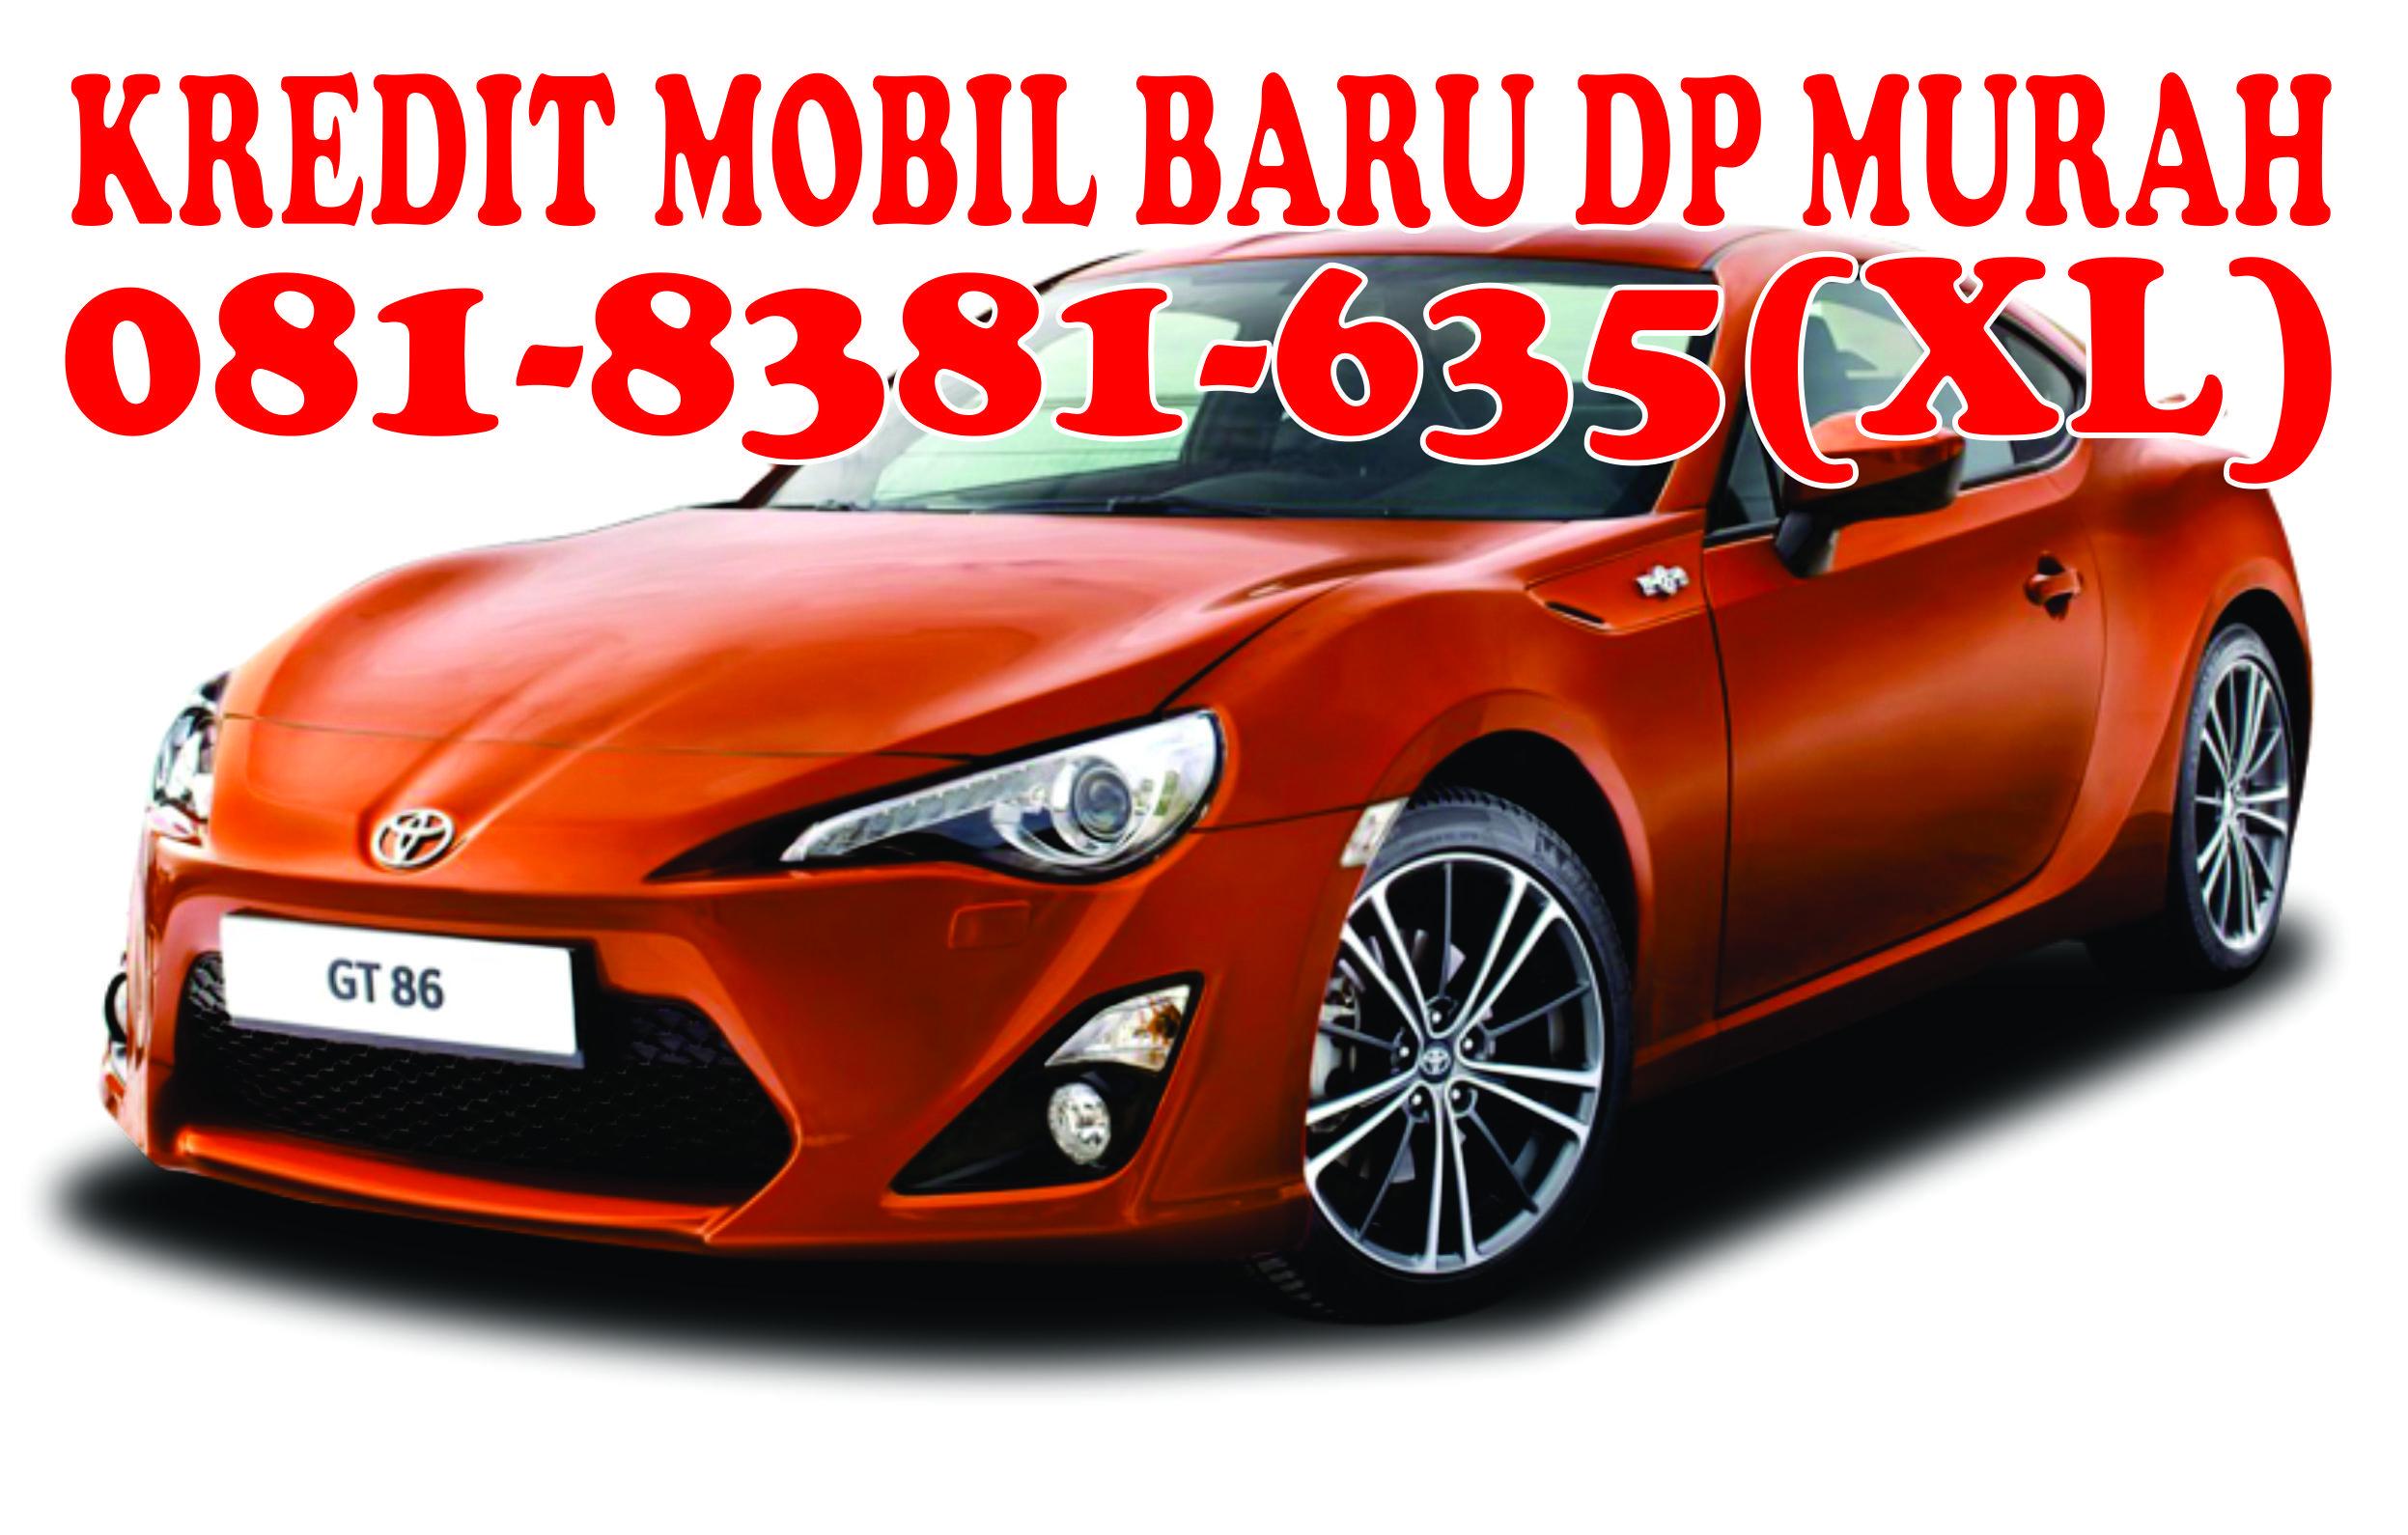 081 8381 635 Xl Dealer Toyota Surabaya Dealer Toyota Surabaya Promo Harga Harga Promo Mobil Toyota Mobil Baru